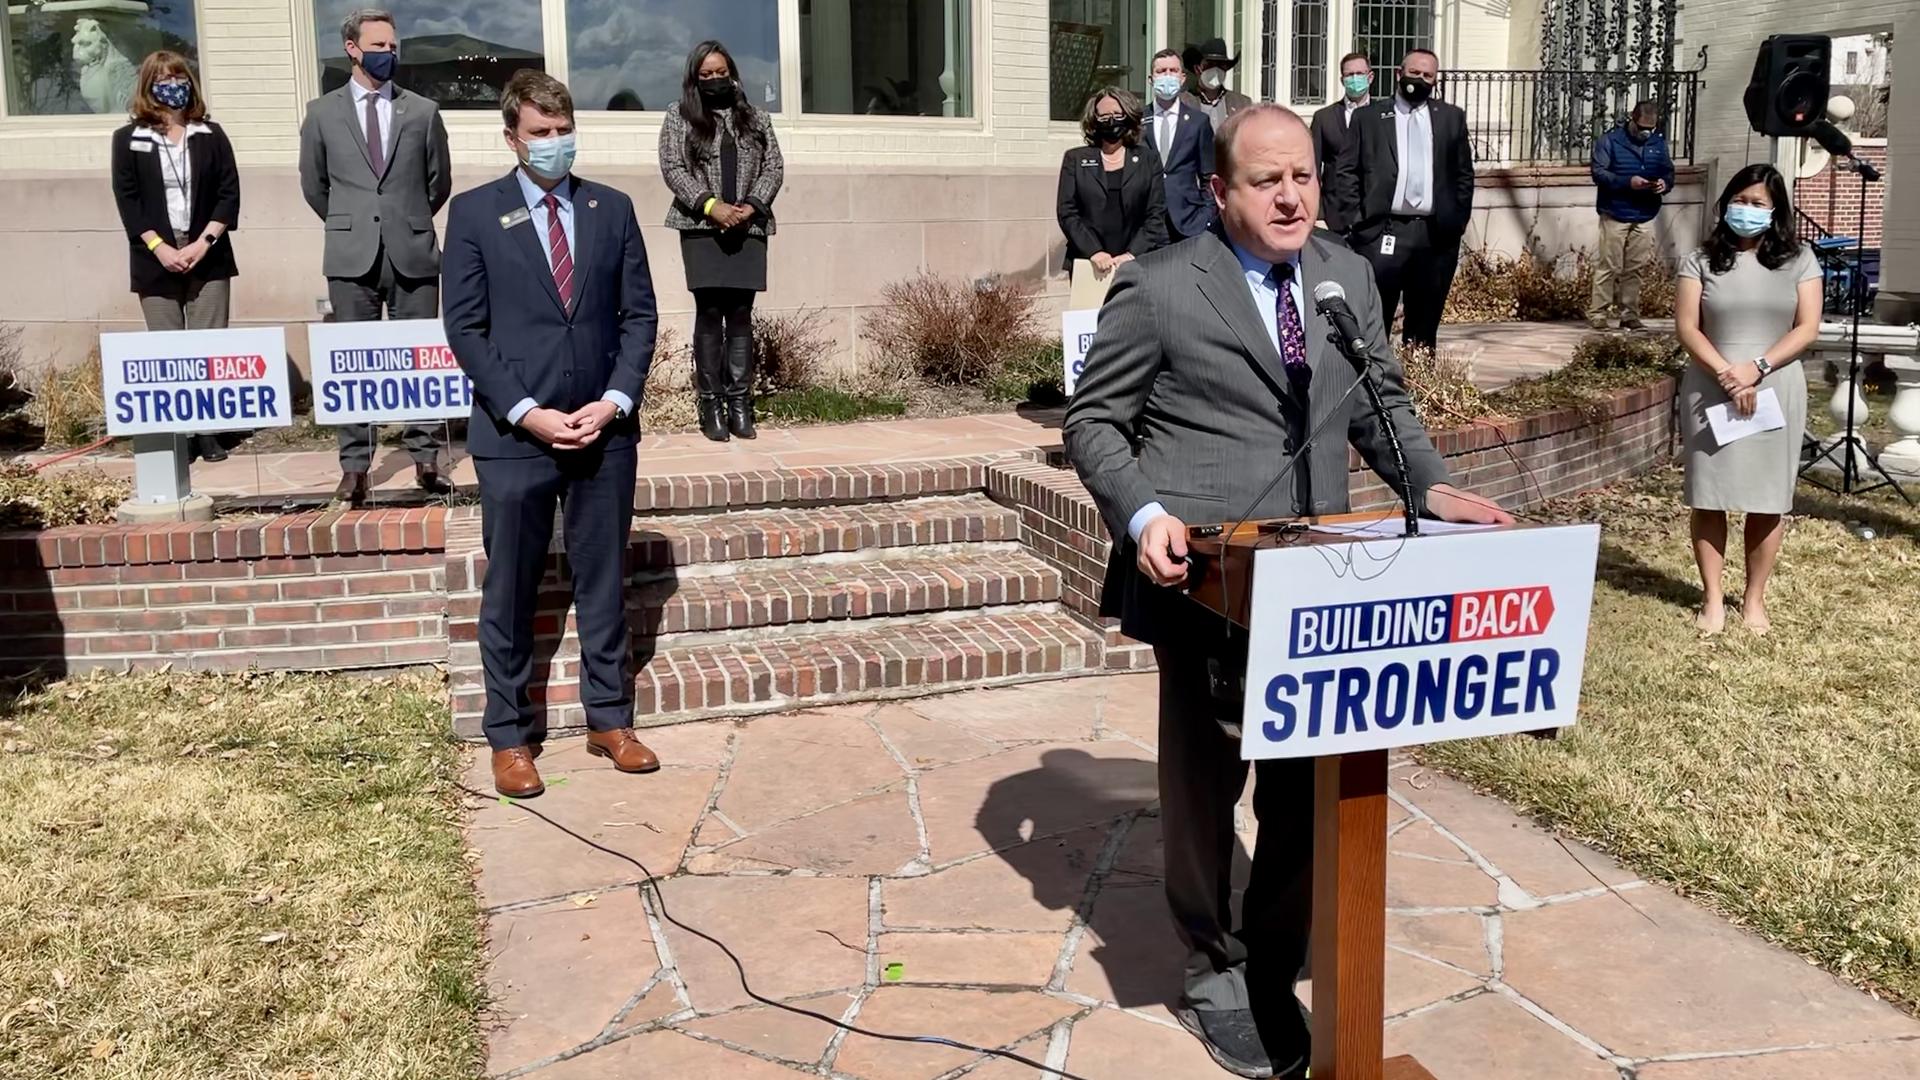 Gov. Jared Polis stands at a podium